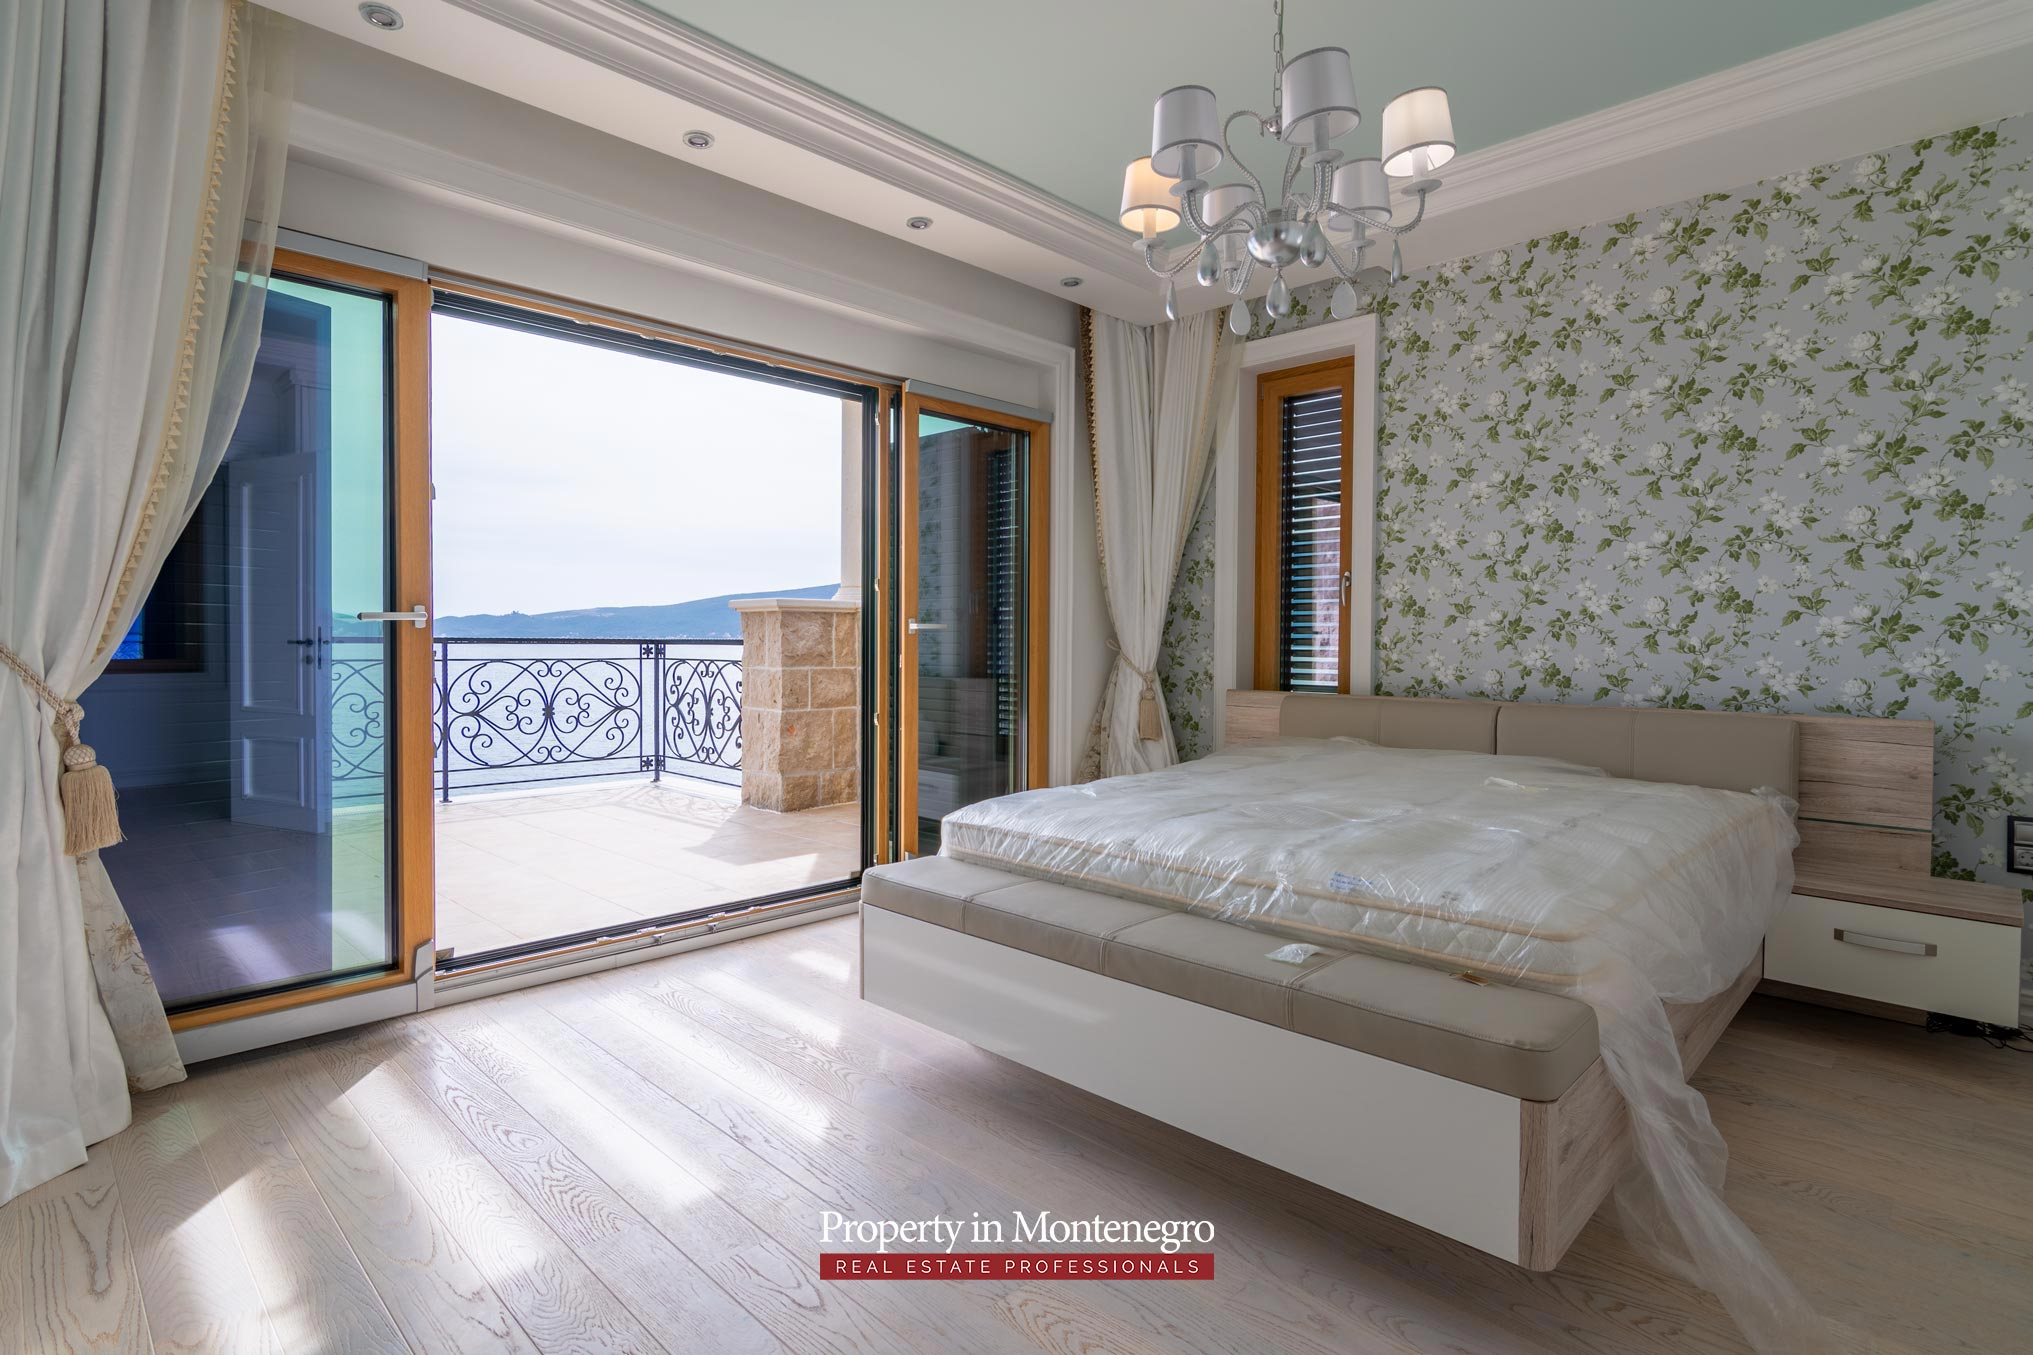 Luxury-waterfront-villa-for-sale-in-Montenegro (38).jpg